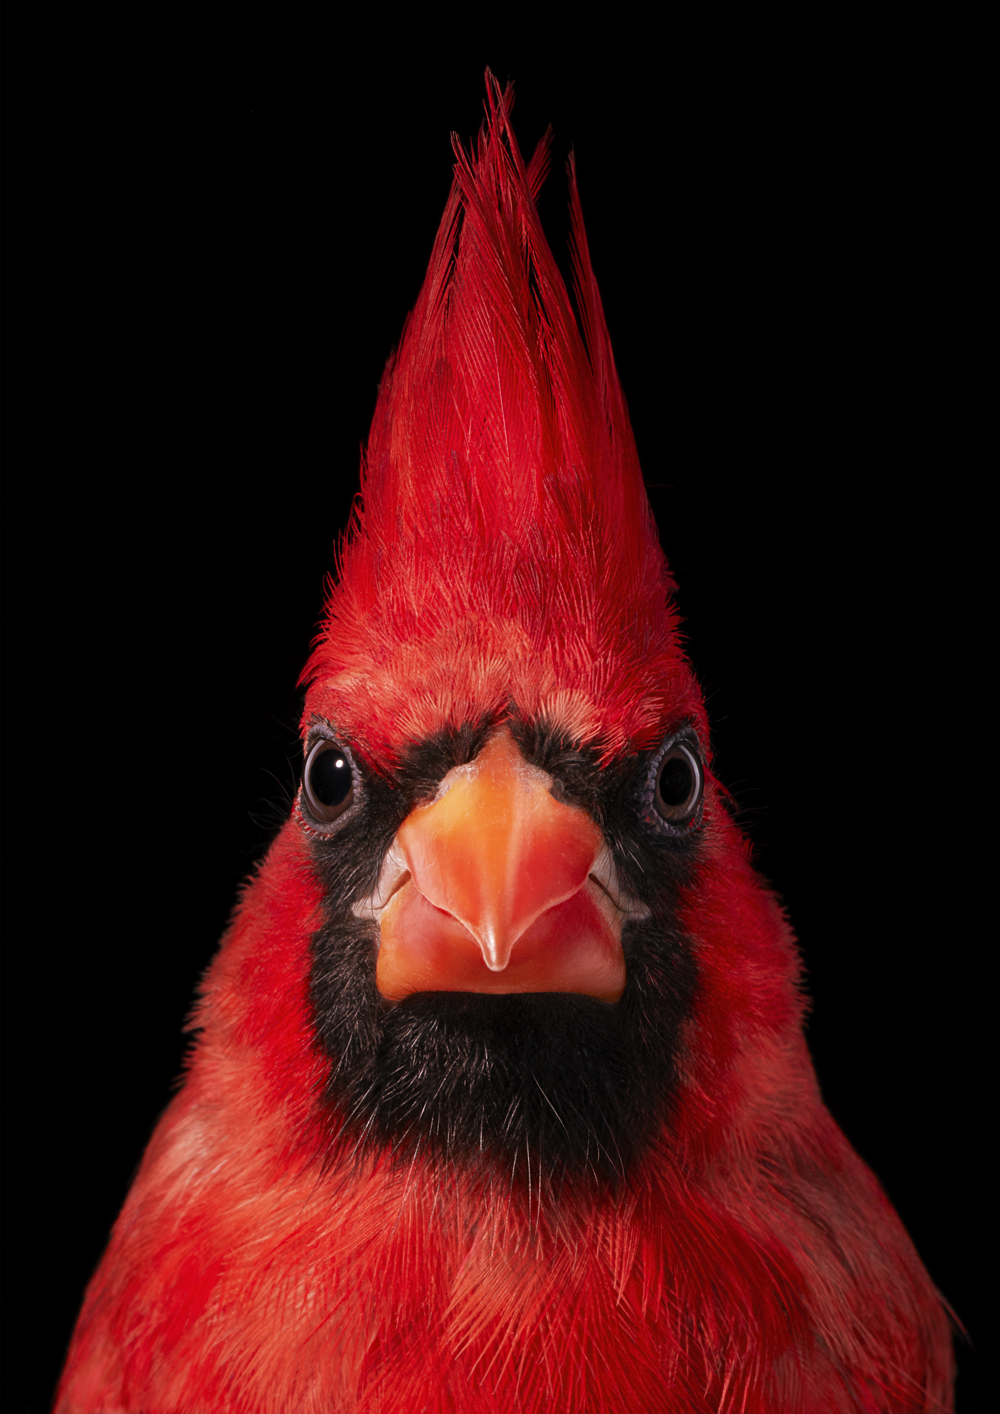 Virginia Cardinal by Tim Flach